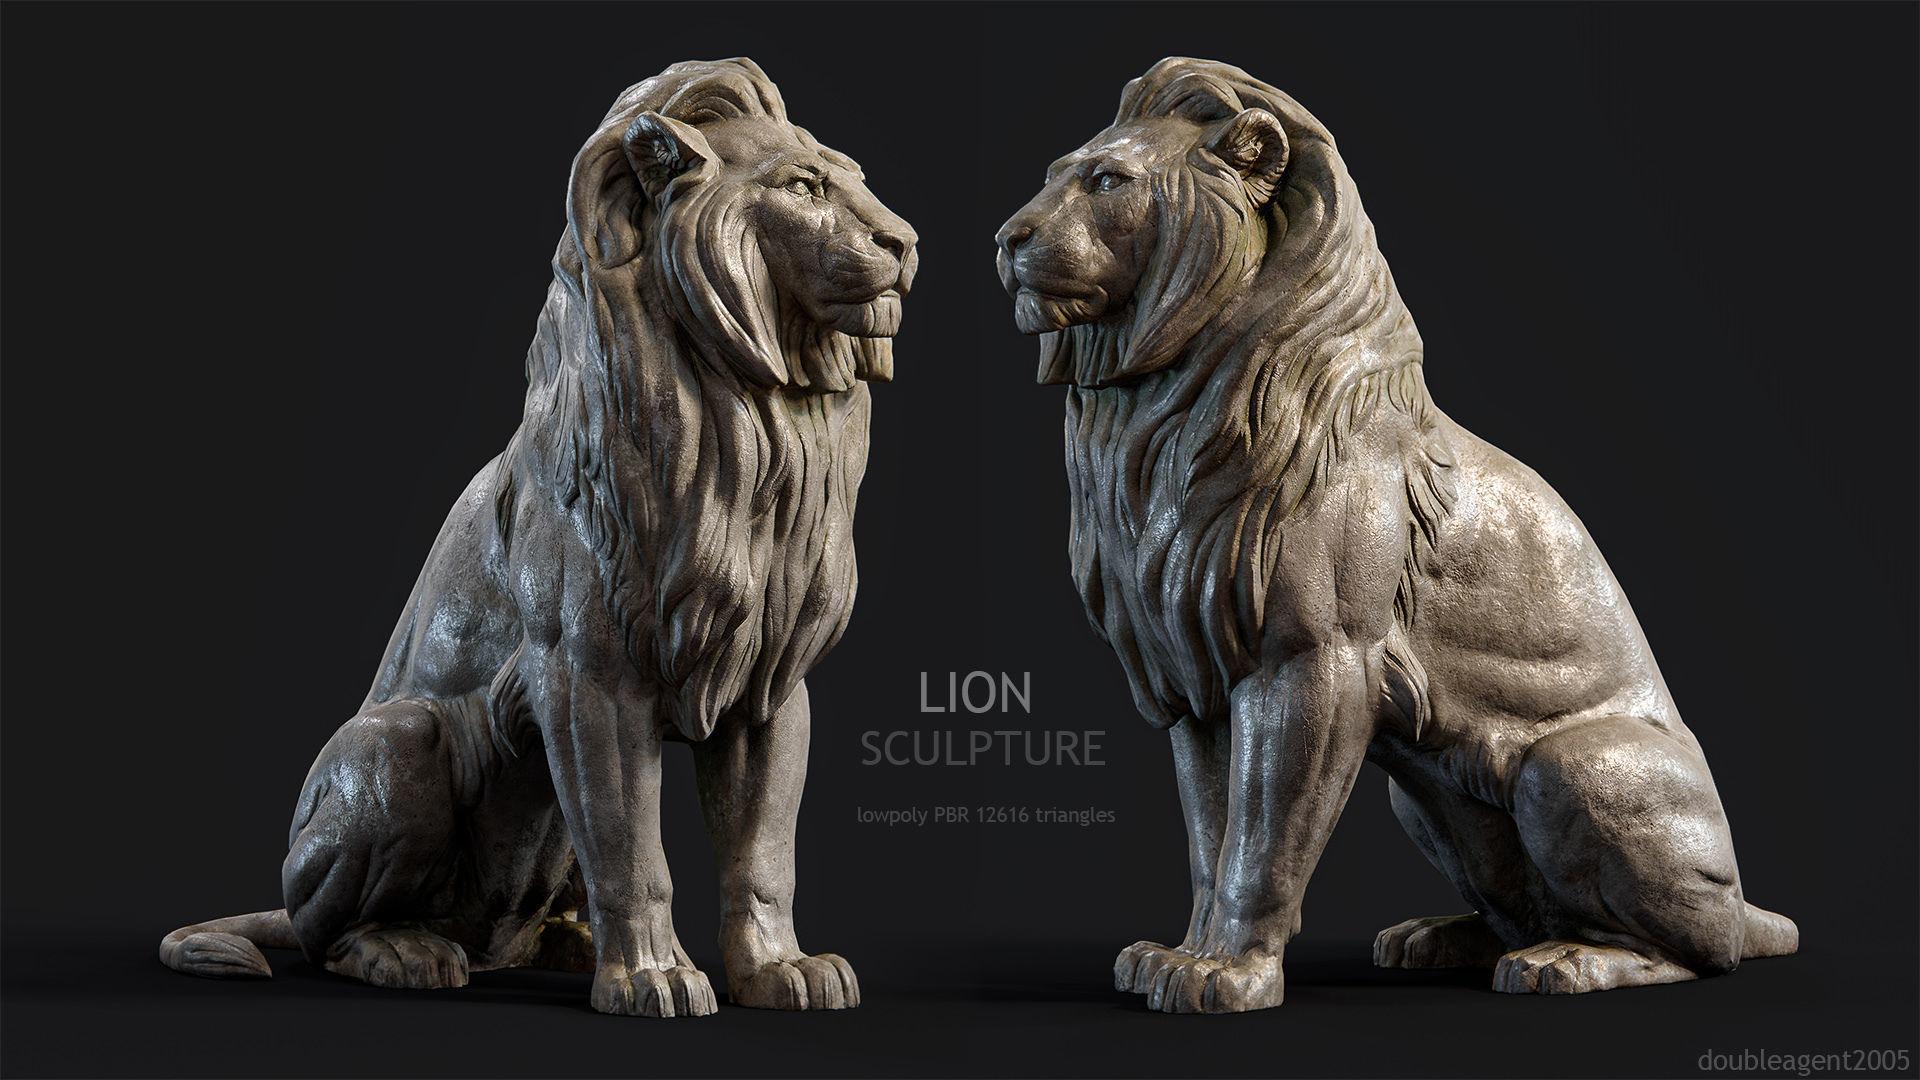 Sitting Lion Sculpture PBR Low-poly